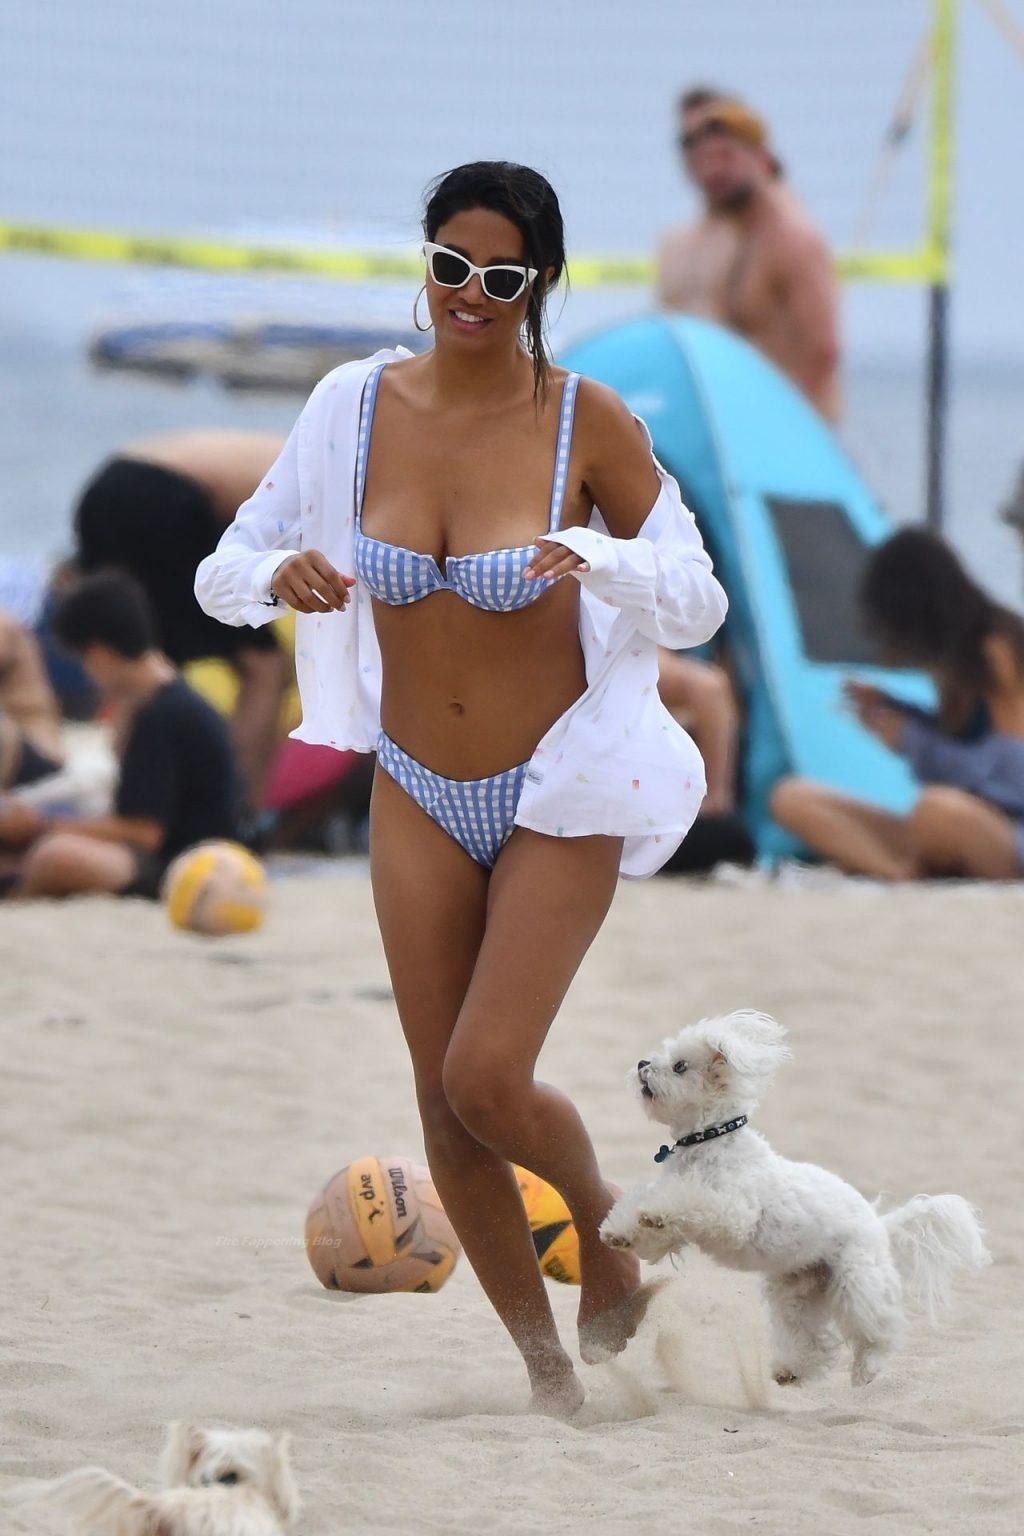 CJ Franco Enjoys a Day on The Beach in Santa Monica (30 Photos + Video)